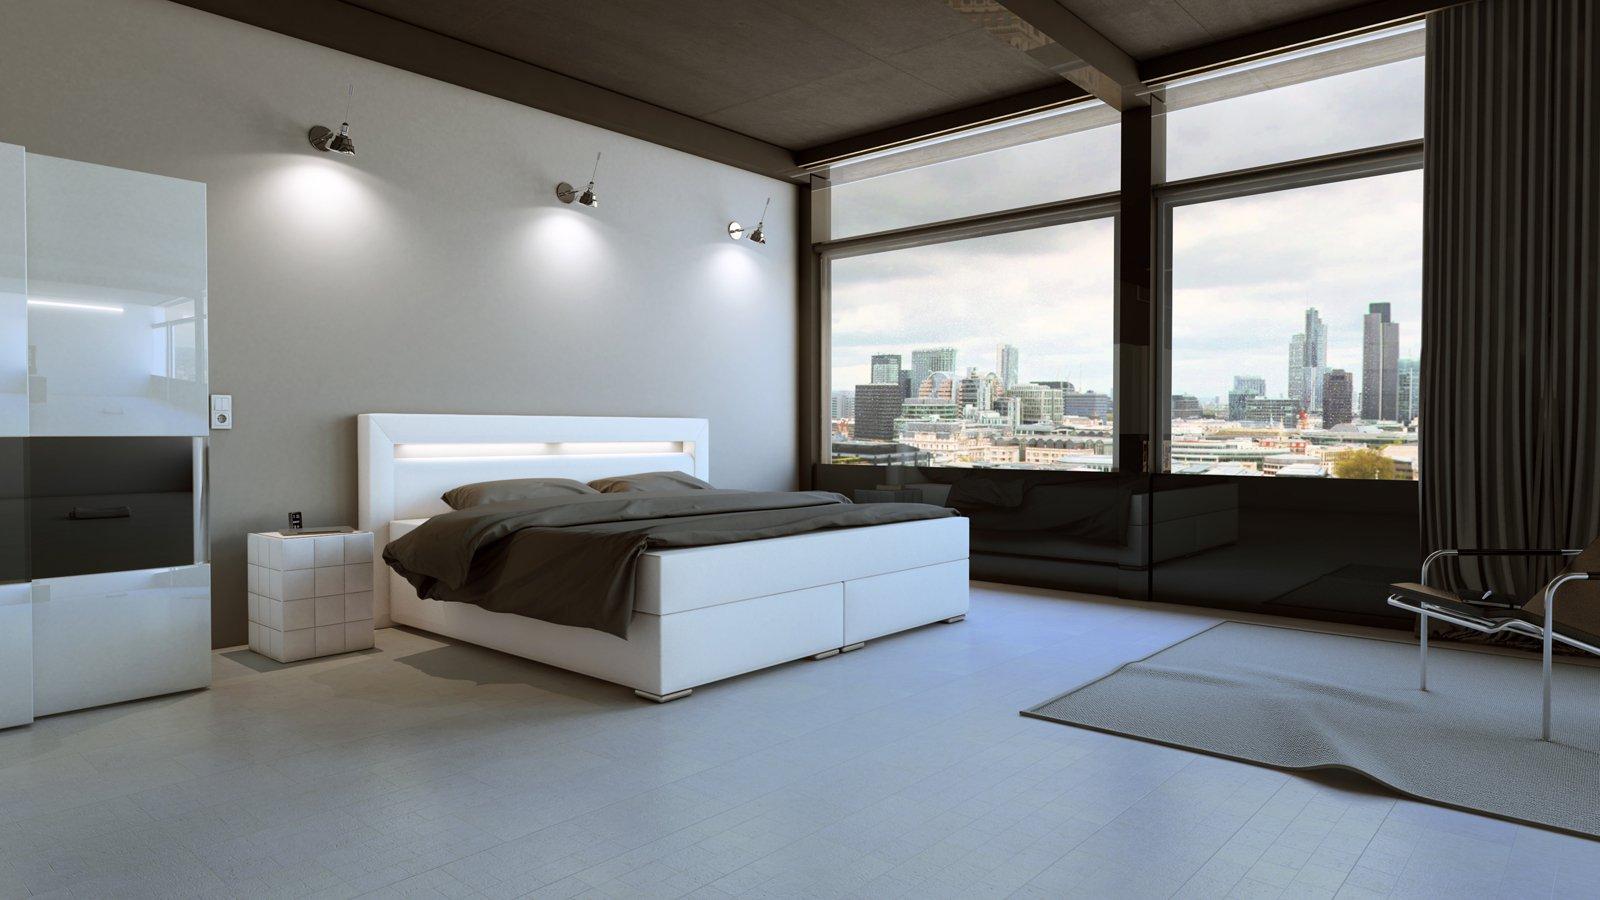 sam boxspringbett hotelbett beleuchtung 180 x 200 cm wei arizona demn chst. Black Bedroom Furniture Sets. Home Design Ideas